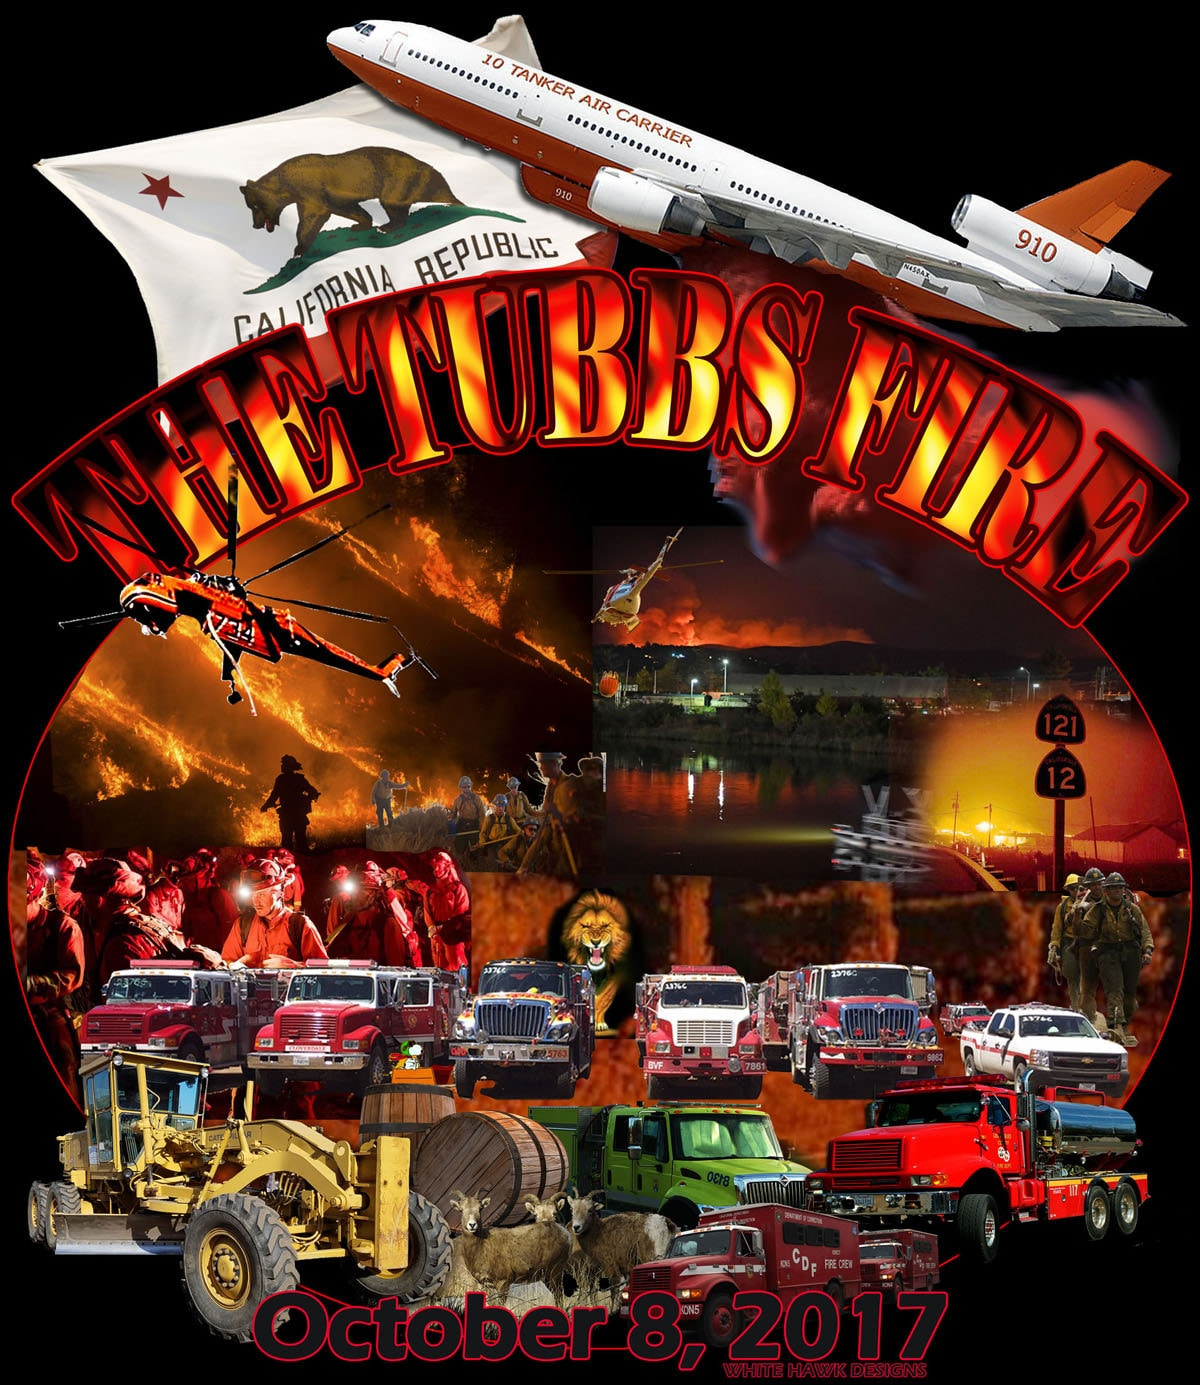 Tubbs Fire Shirt Santa Rosa Tubbs Fire 2017 Santa Rosa Etsy